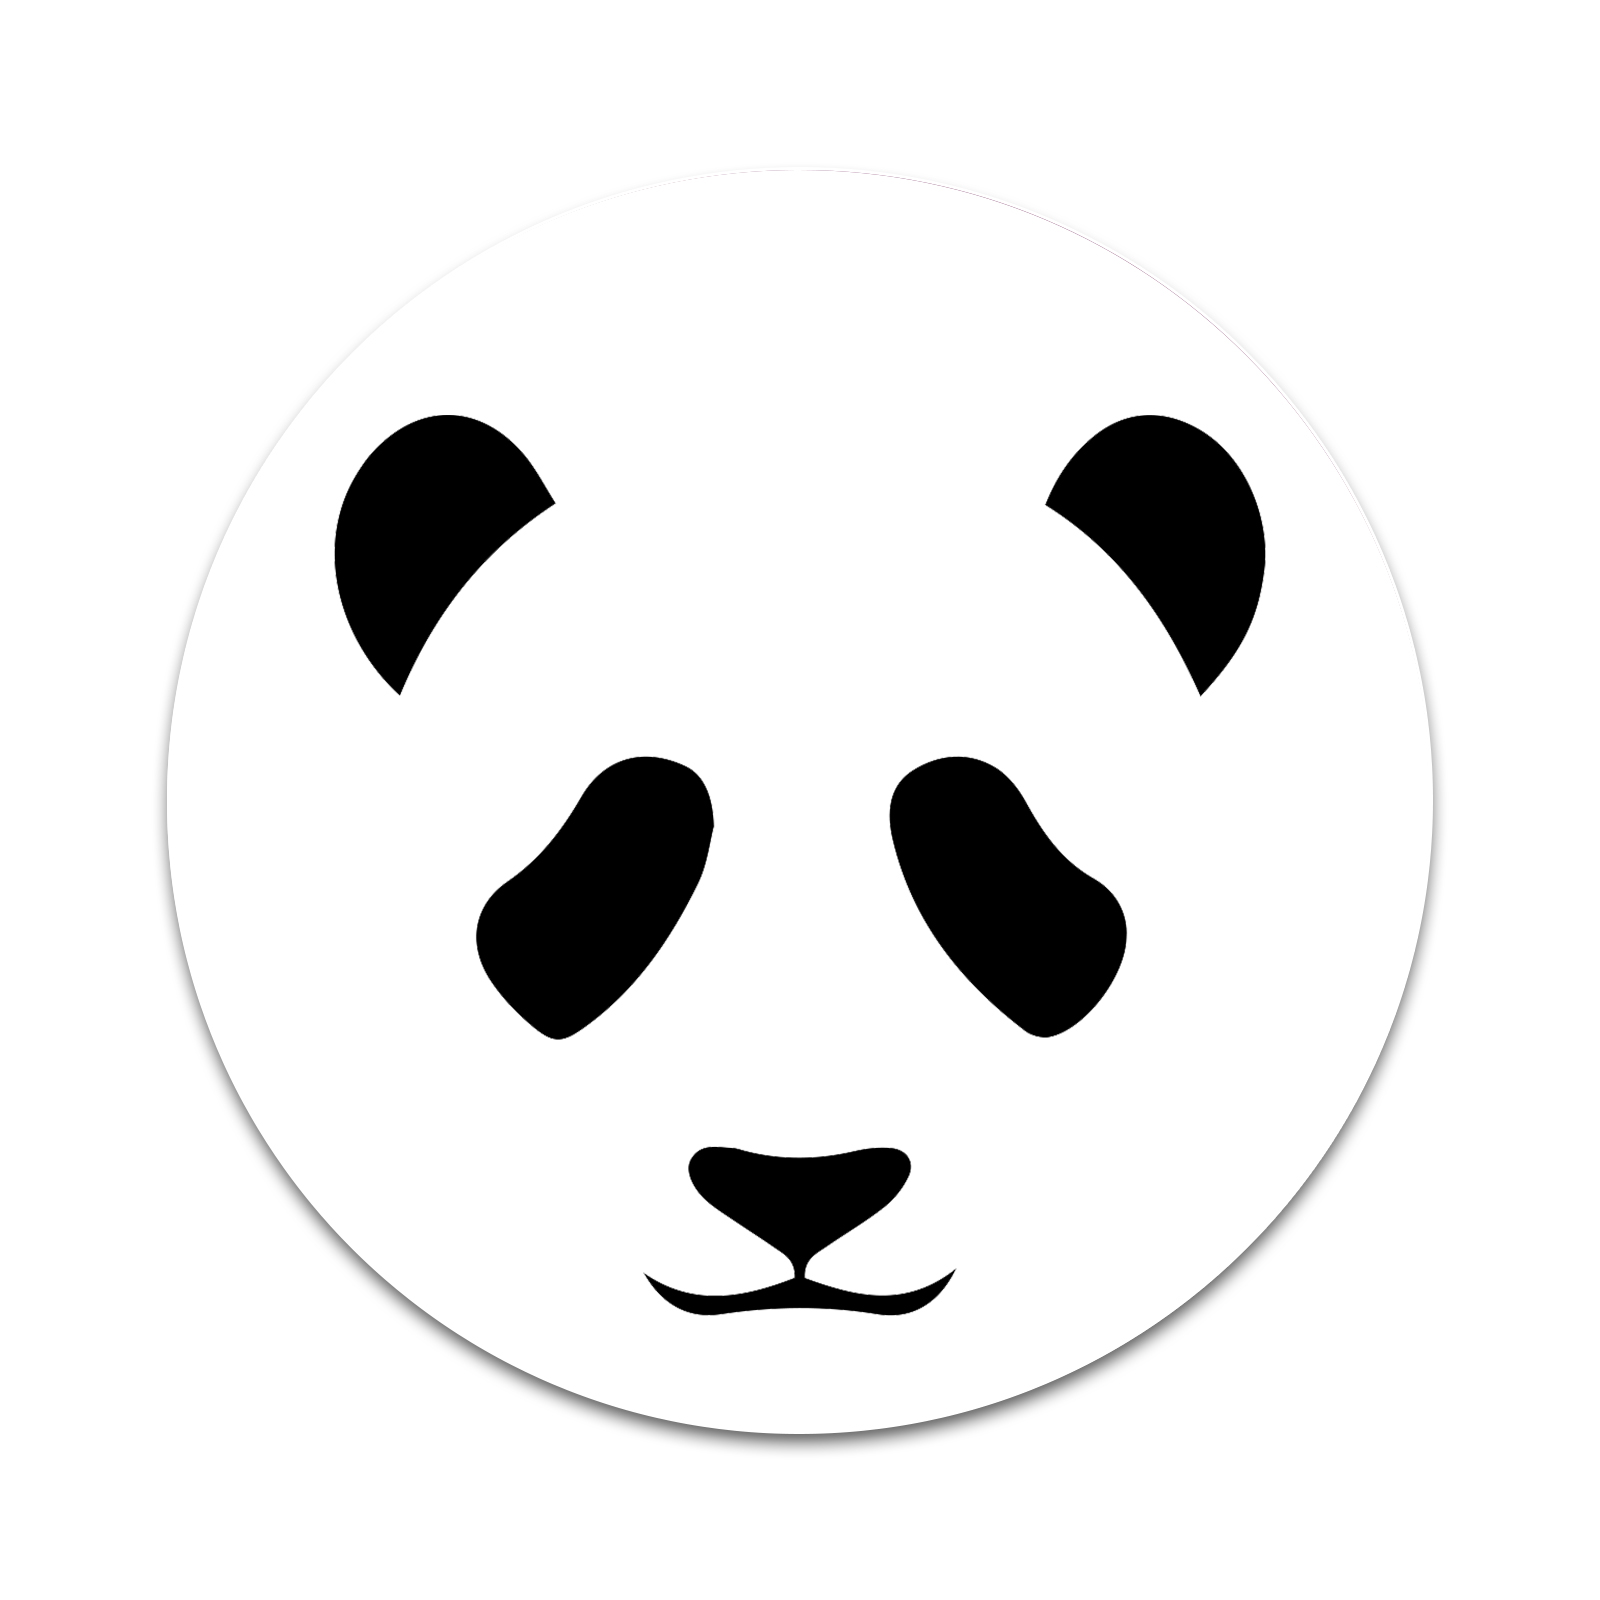 Panda Bear Face 2 Sticker Set For Pop Grip Stent For